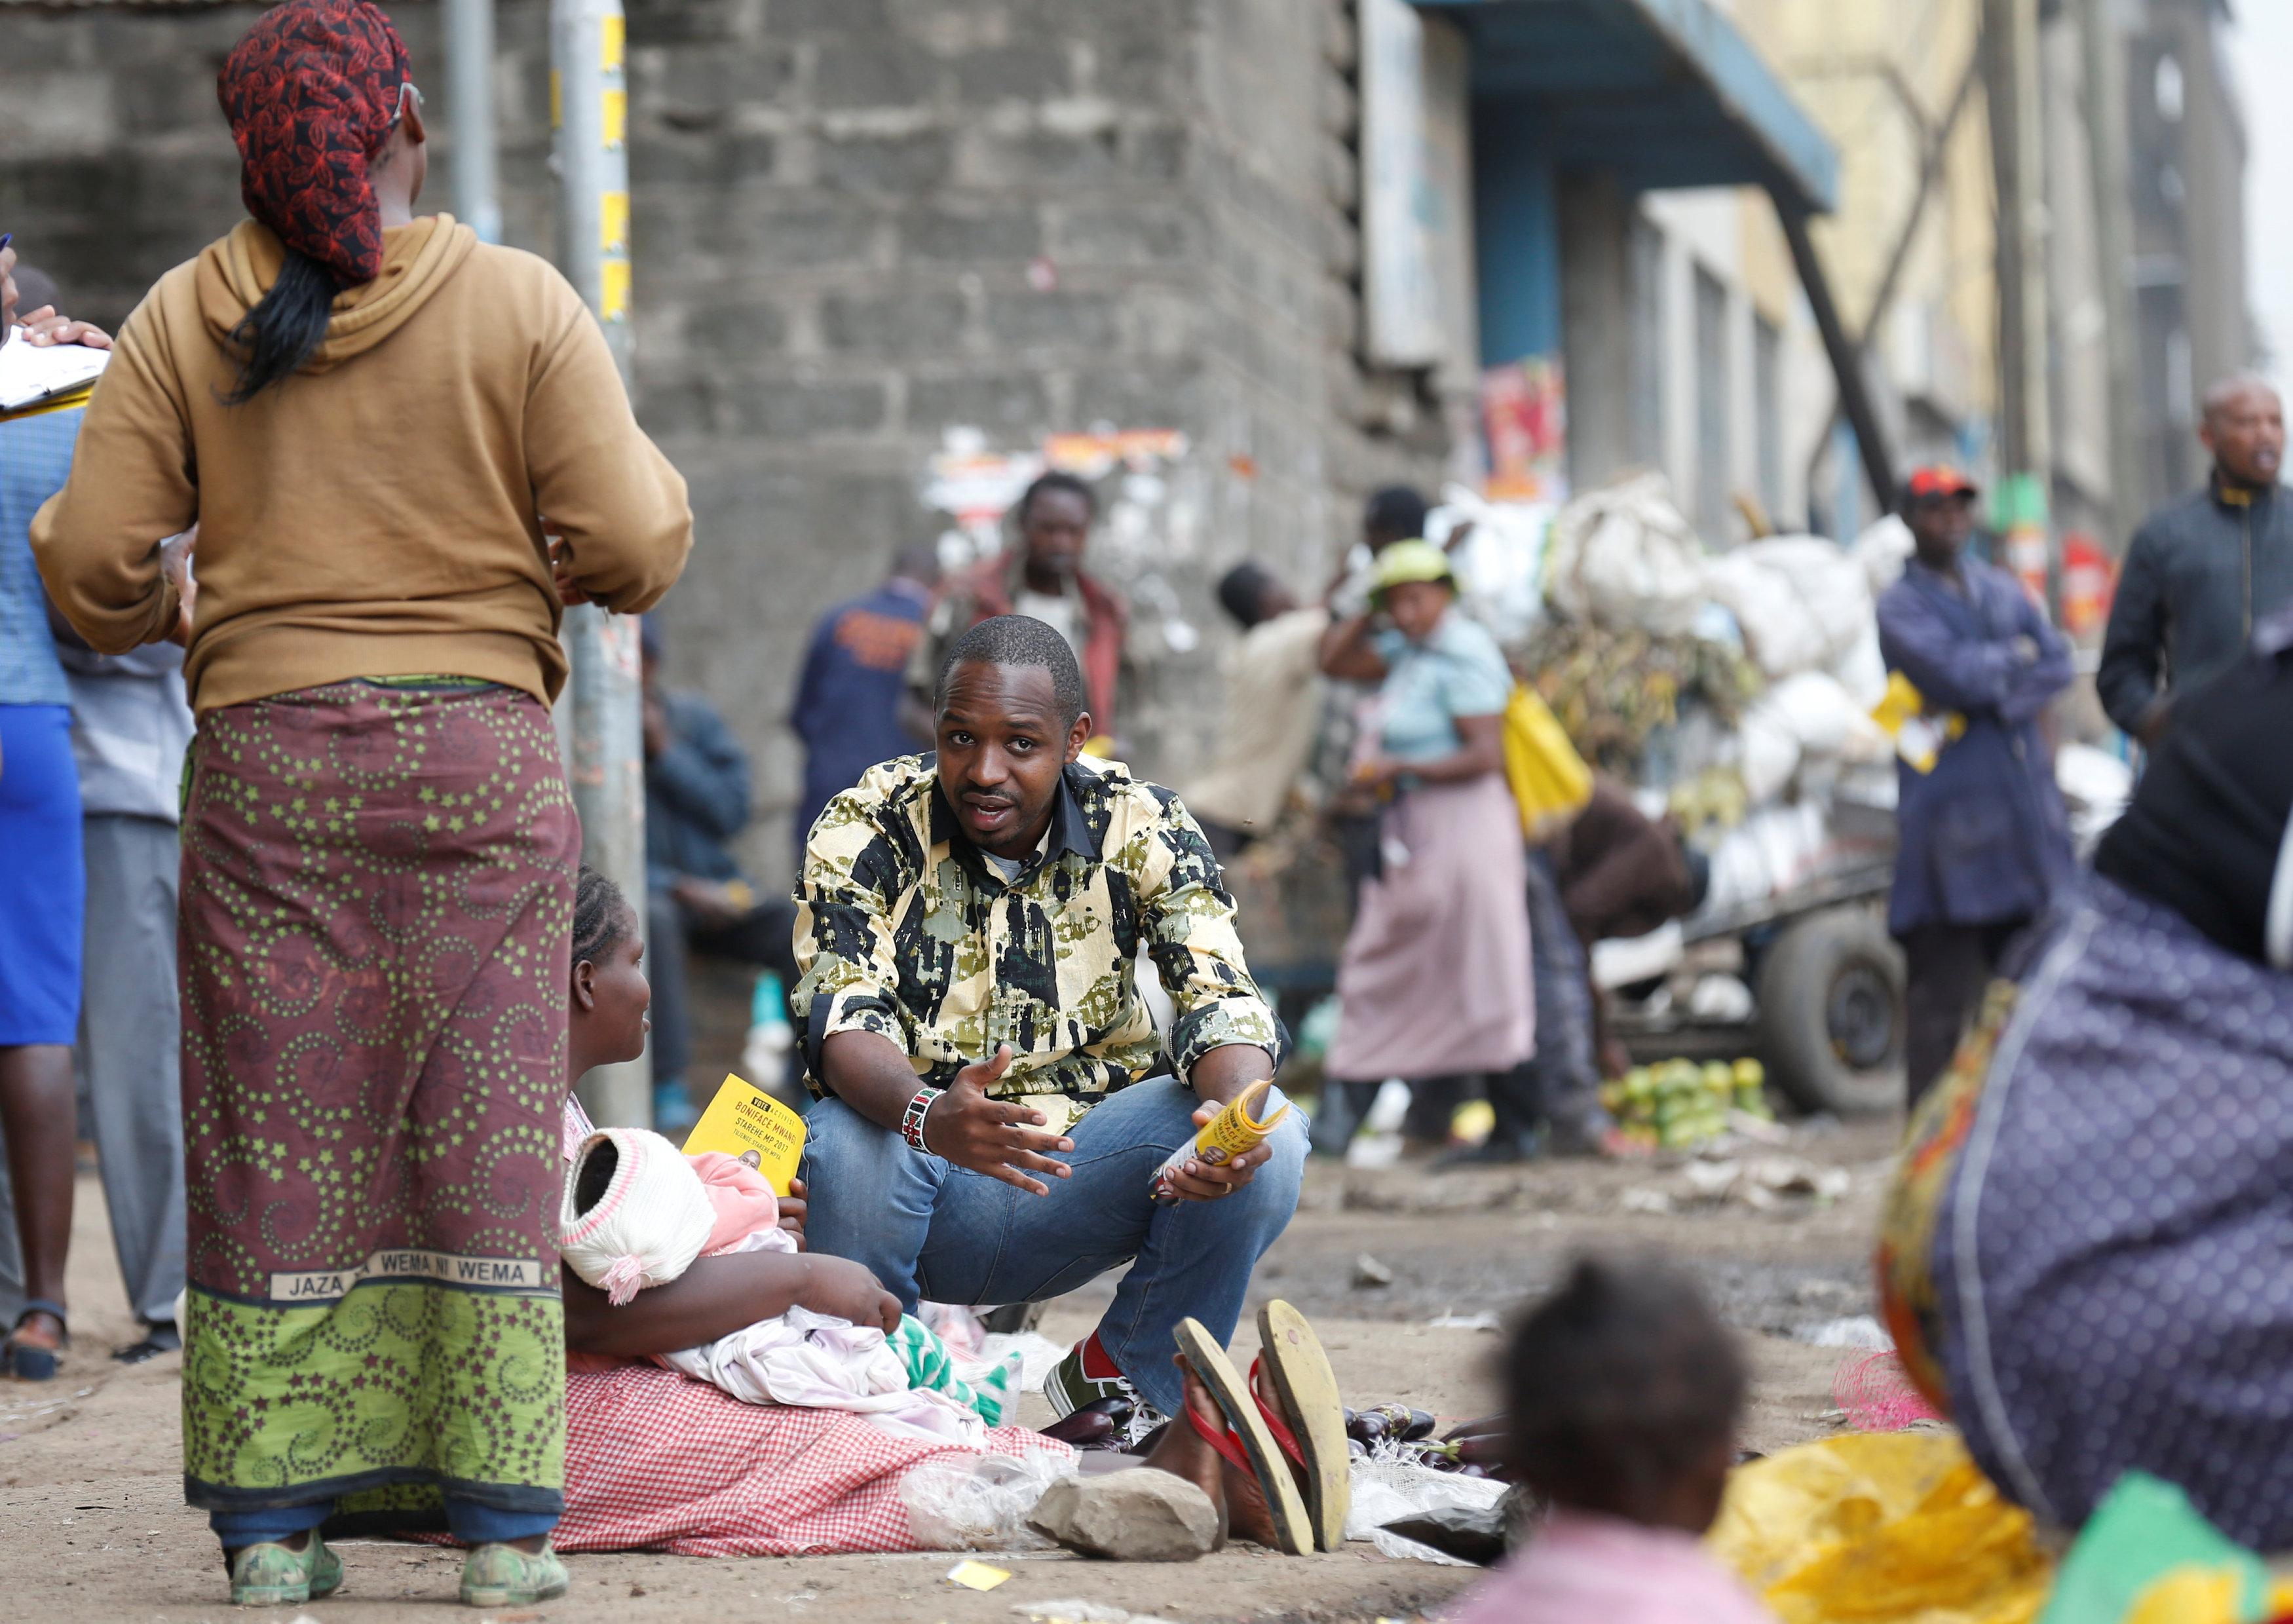 Anti-graft activist stirs up Kenyans with parliament campaign